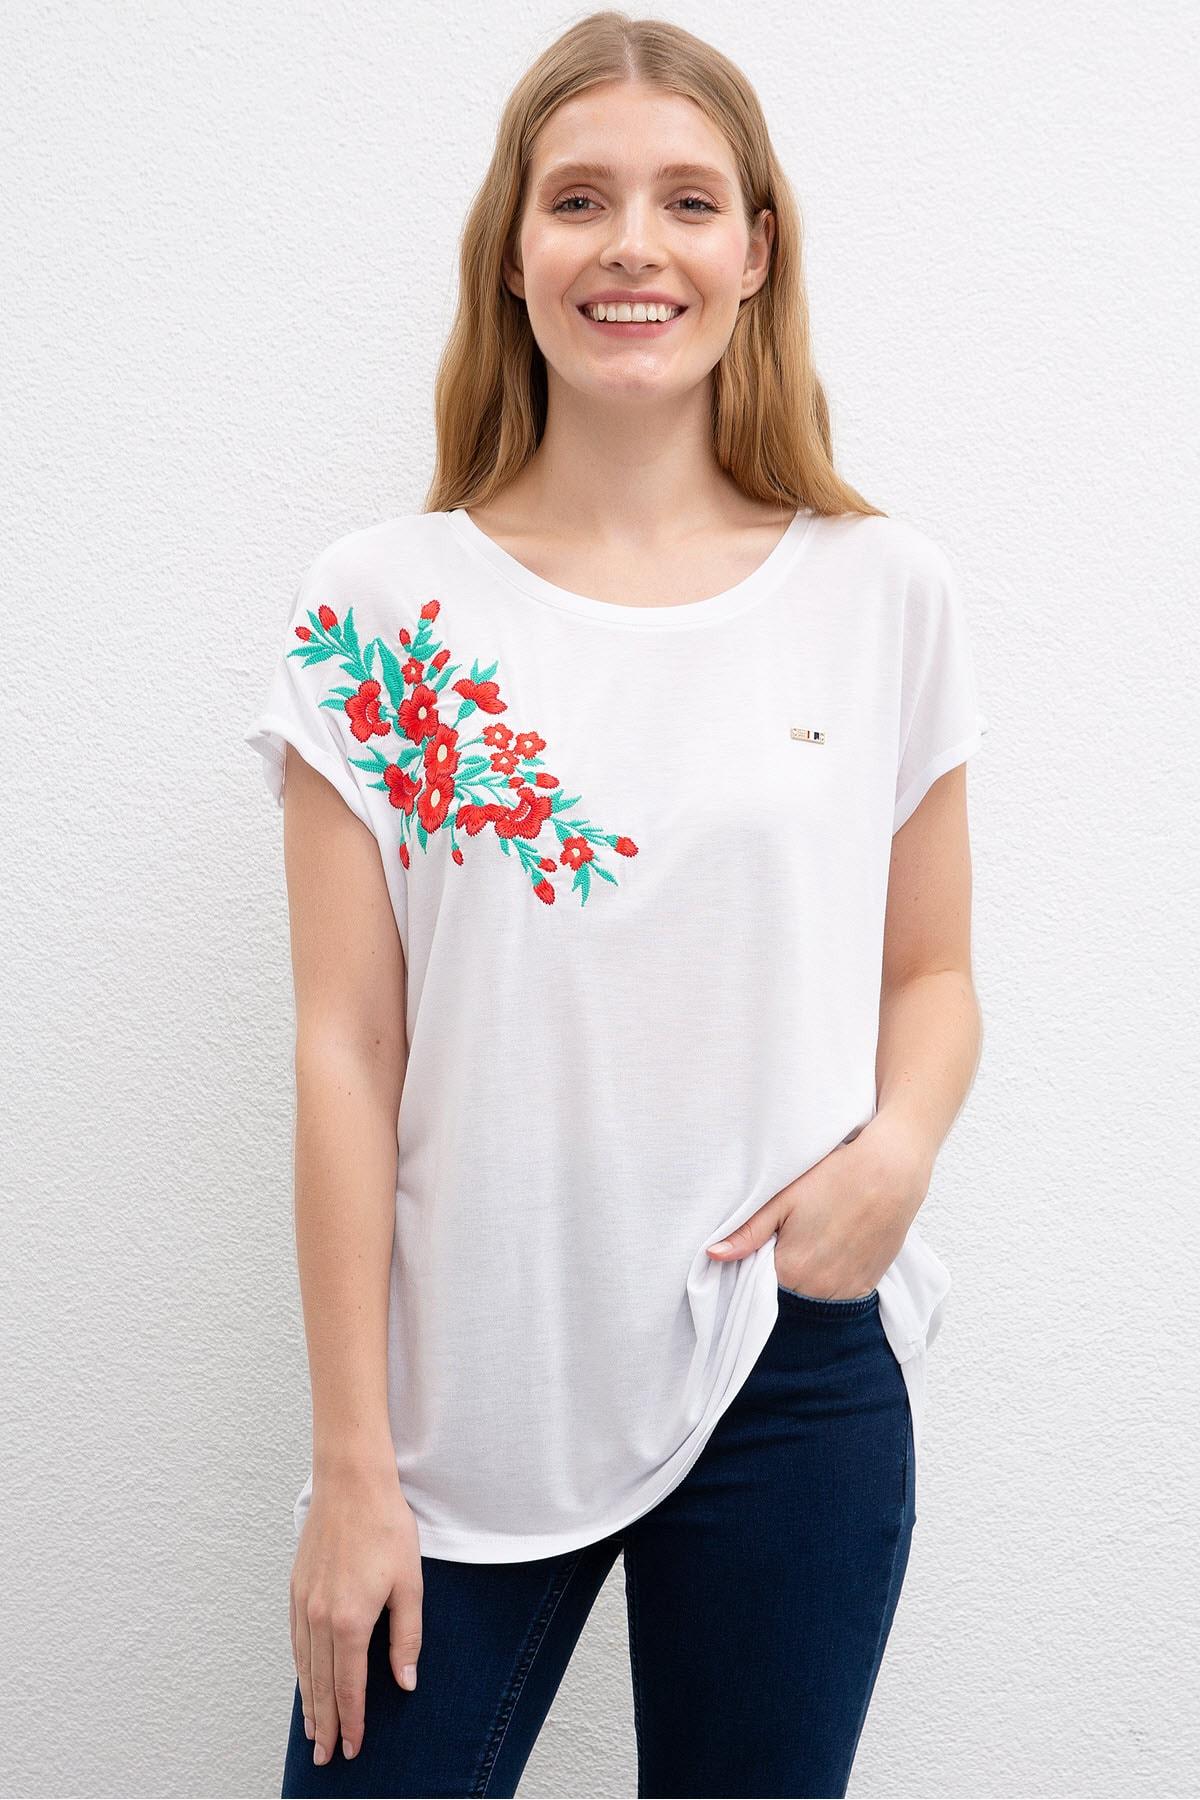 US Polo Assn Beyaz Kadin T-Shirt